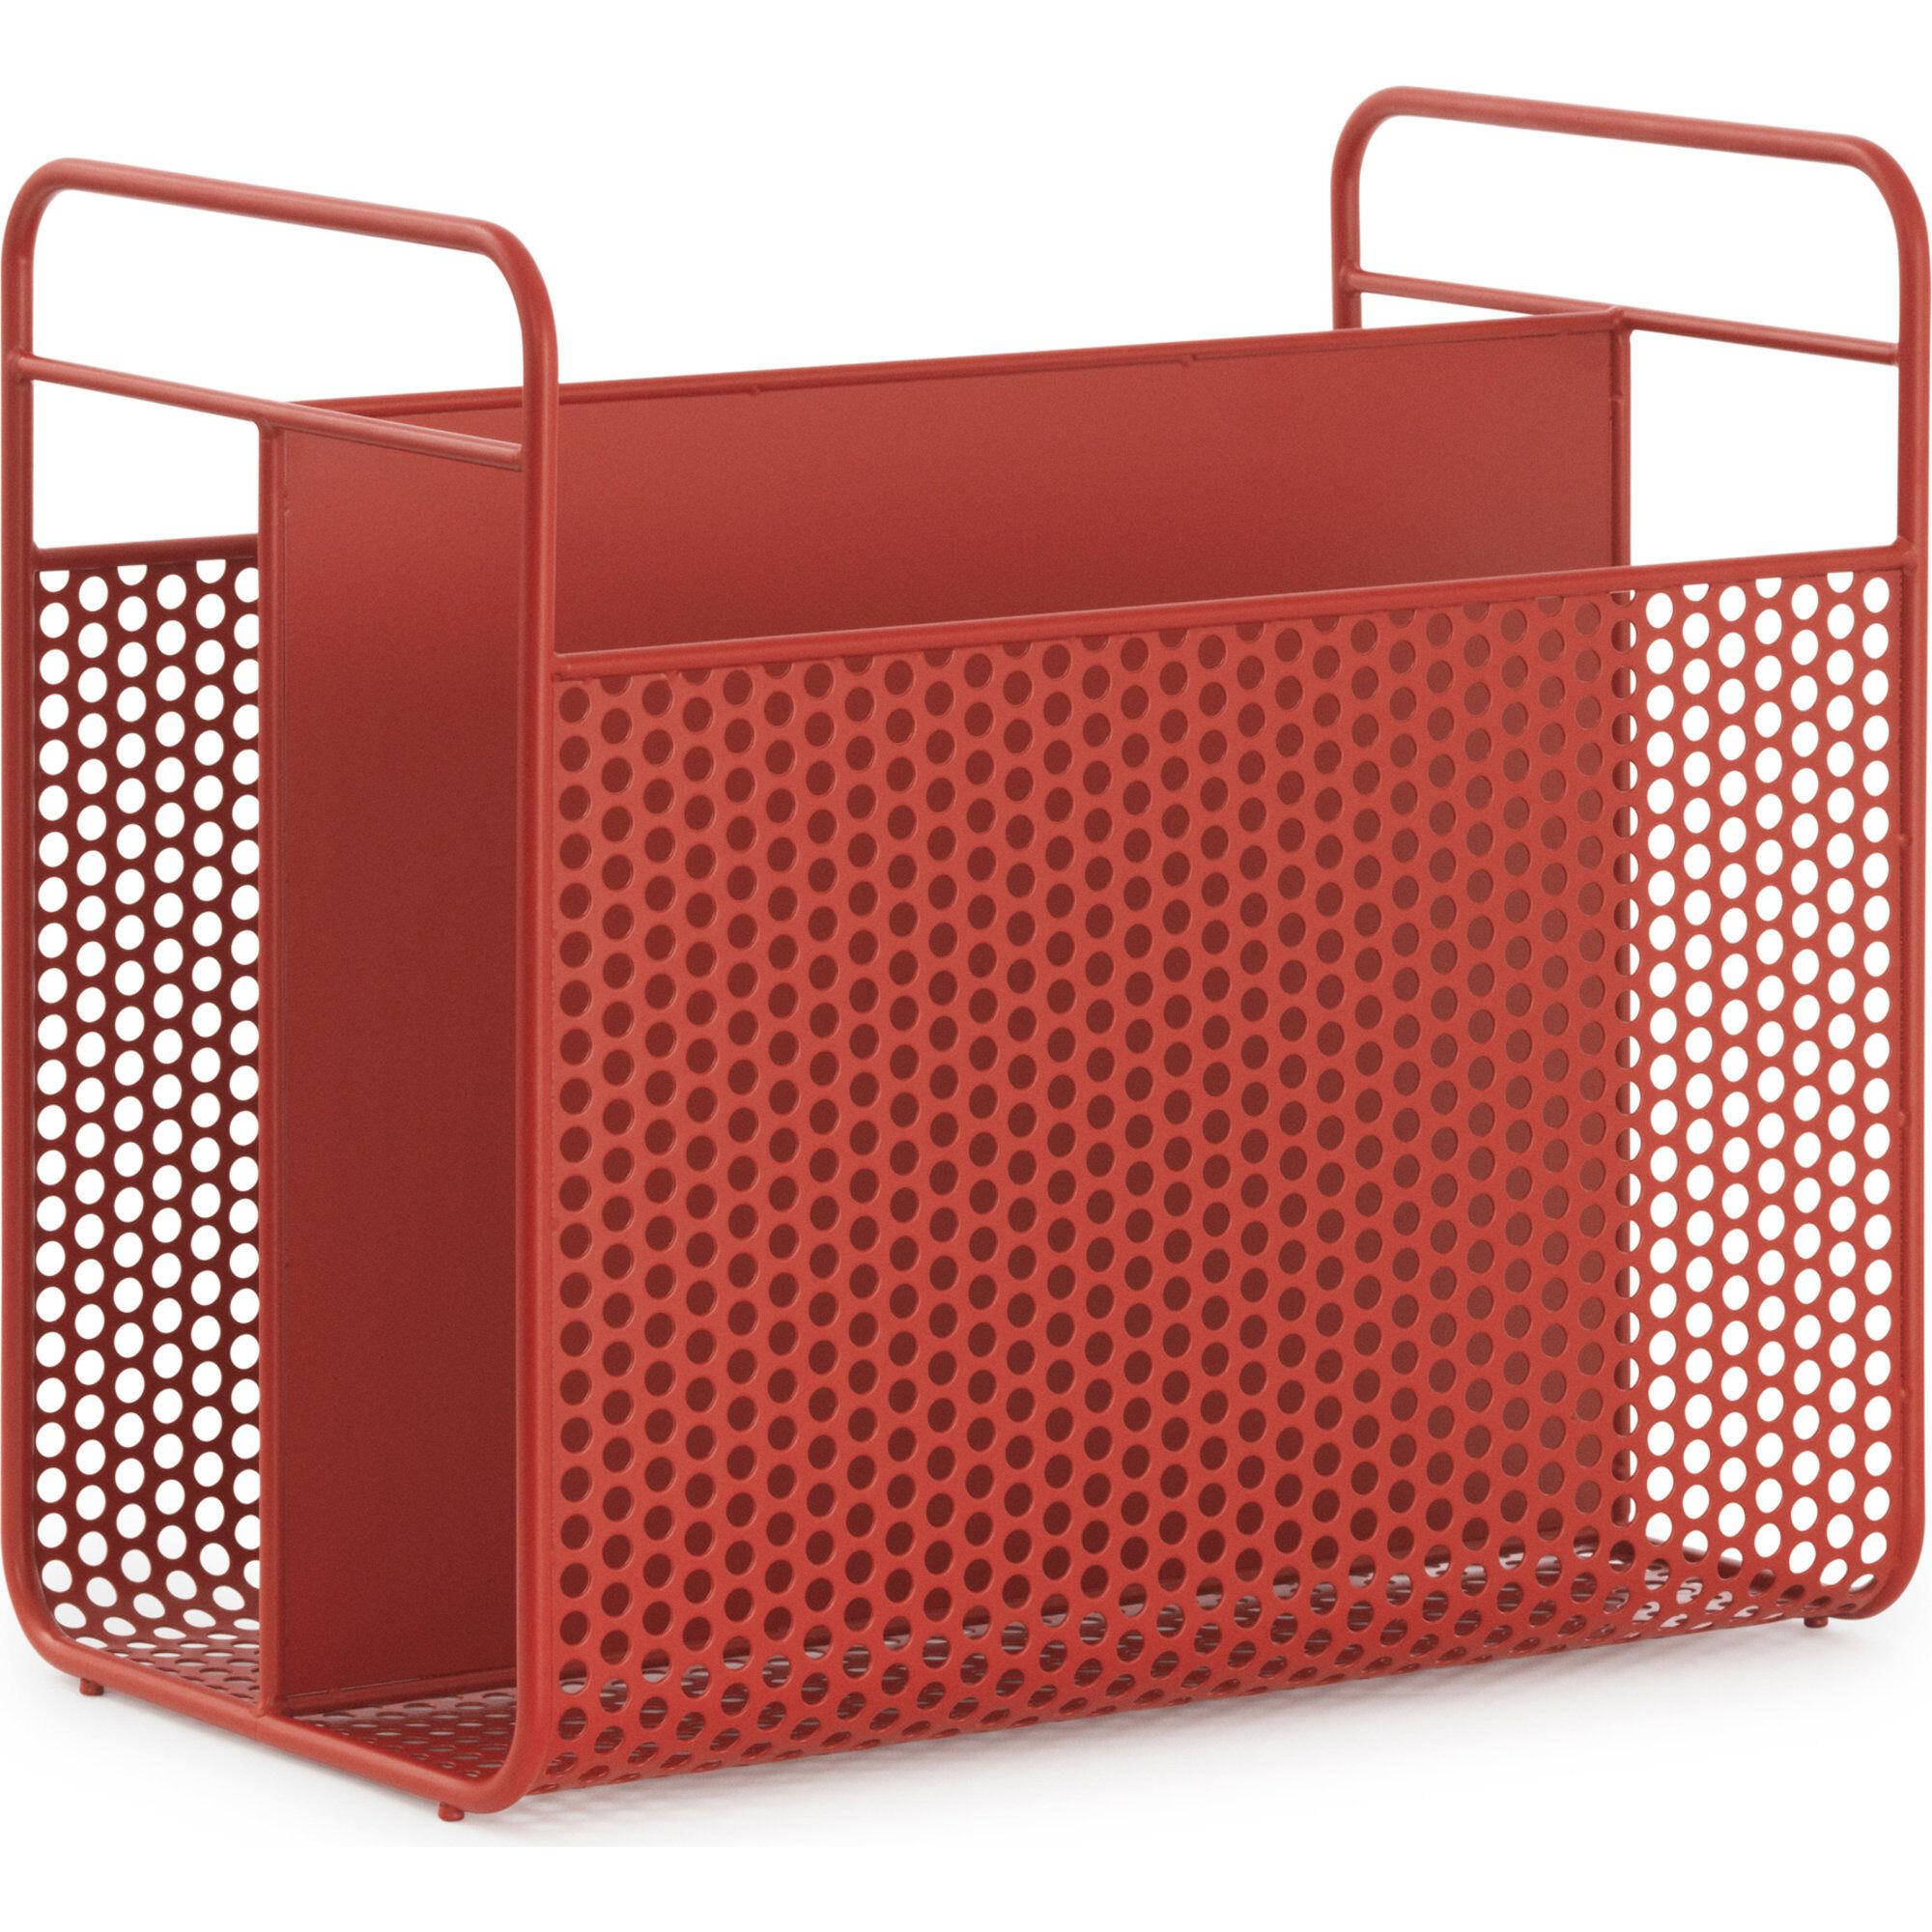 Normann Copenhagen Magazine Rack Red